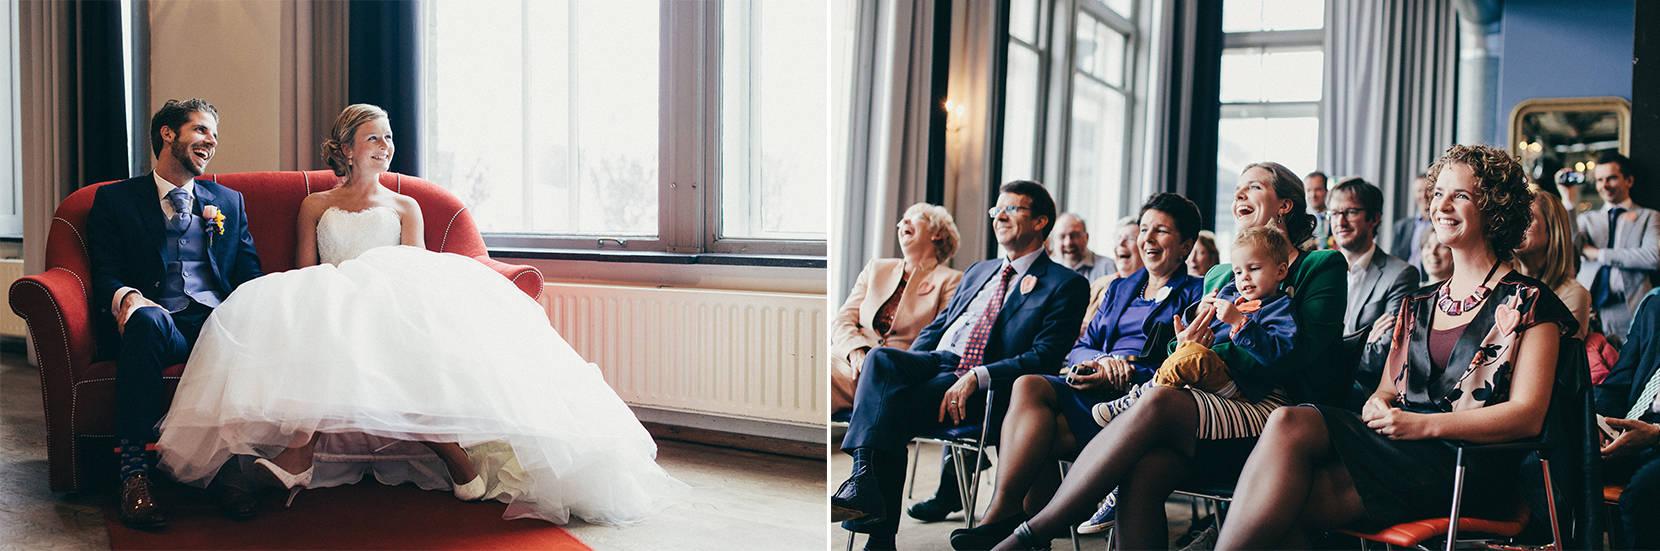 Bruidsfotografie_Rotterdam_Rogier_Martine-34